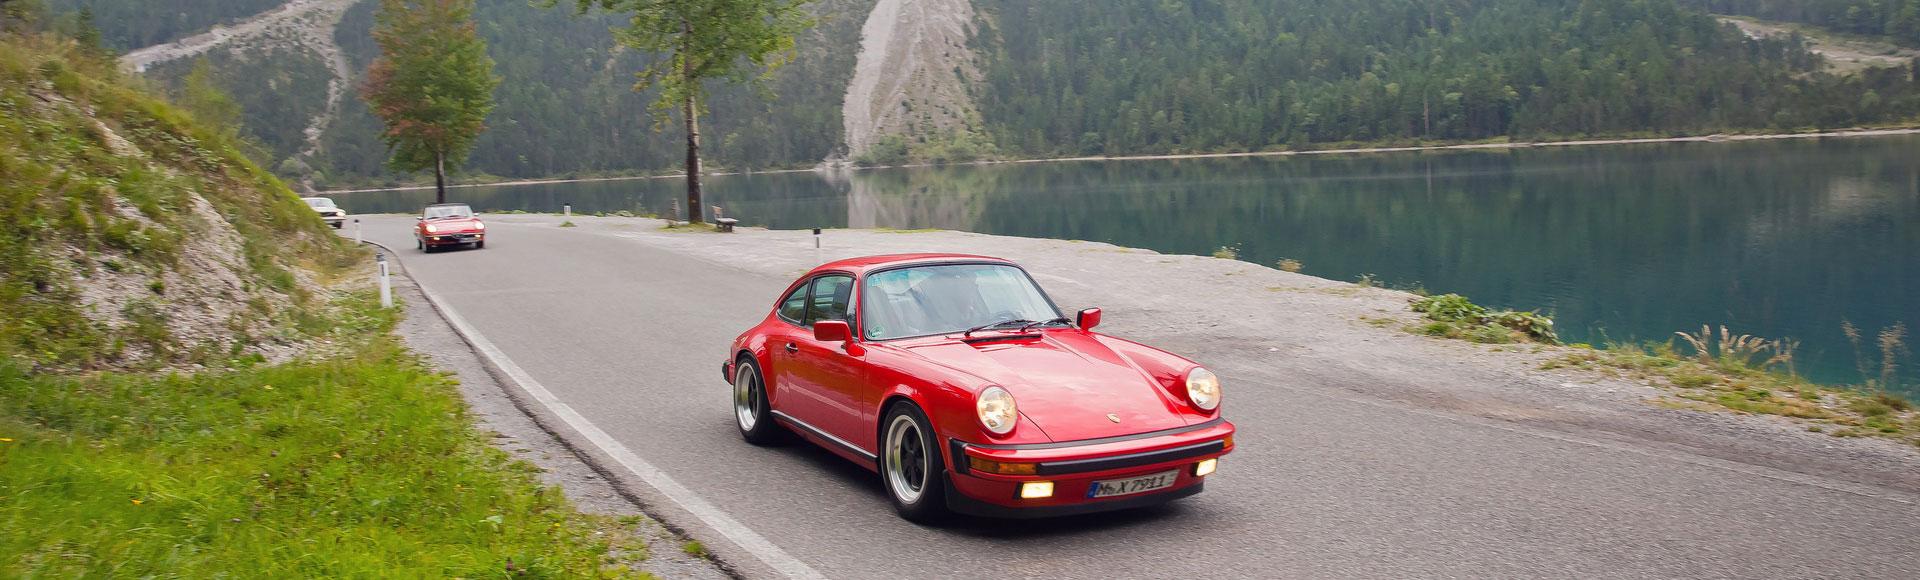 Porsche 911 Carrera Coupe 1987 0006 Herbst